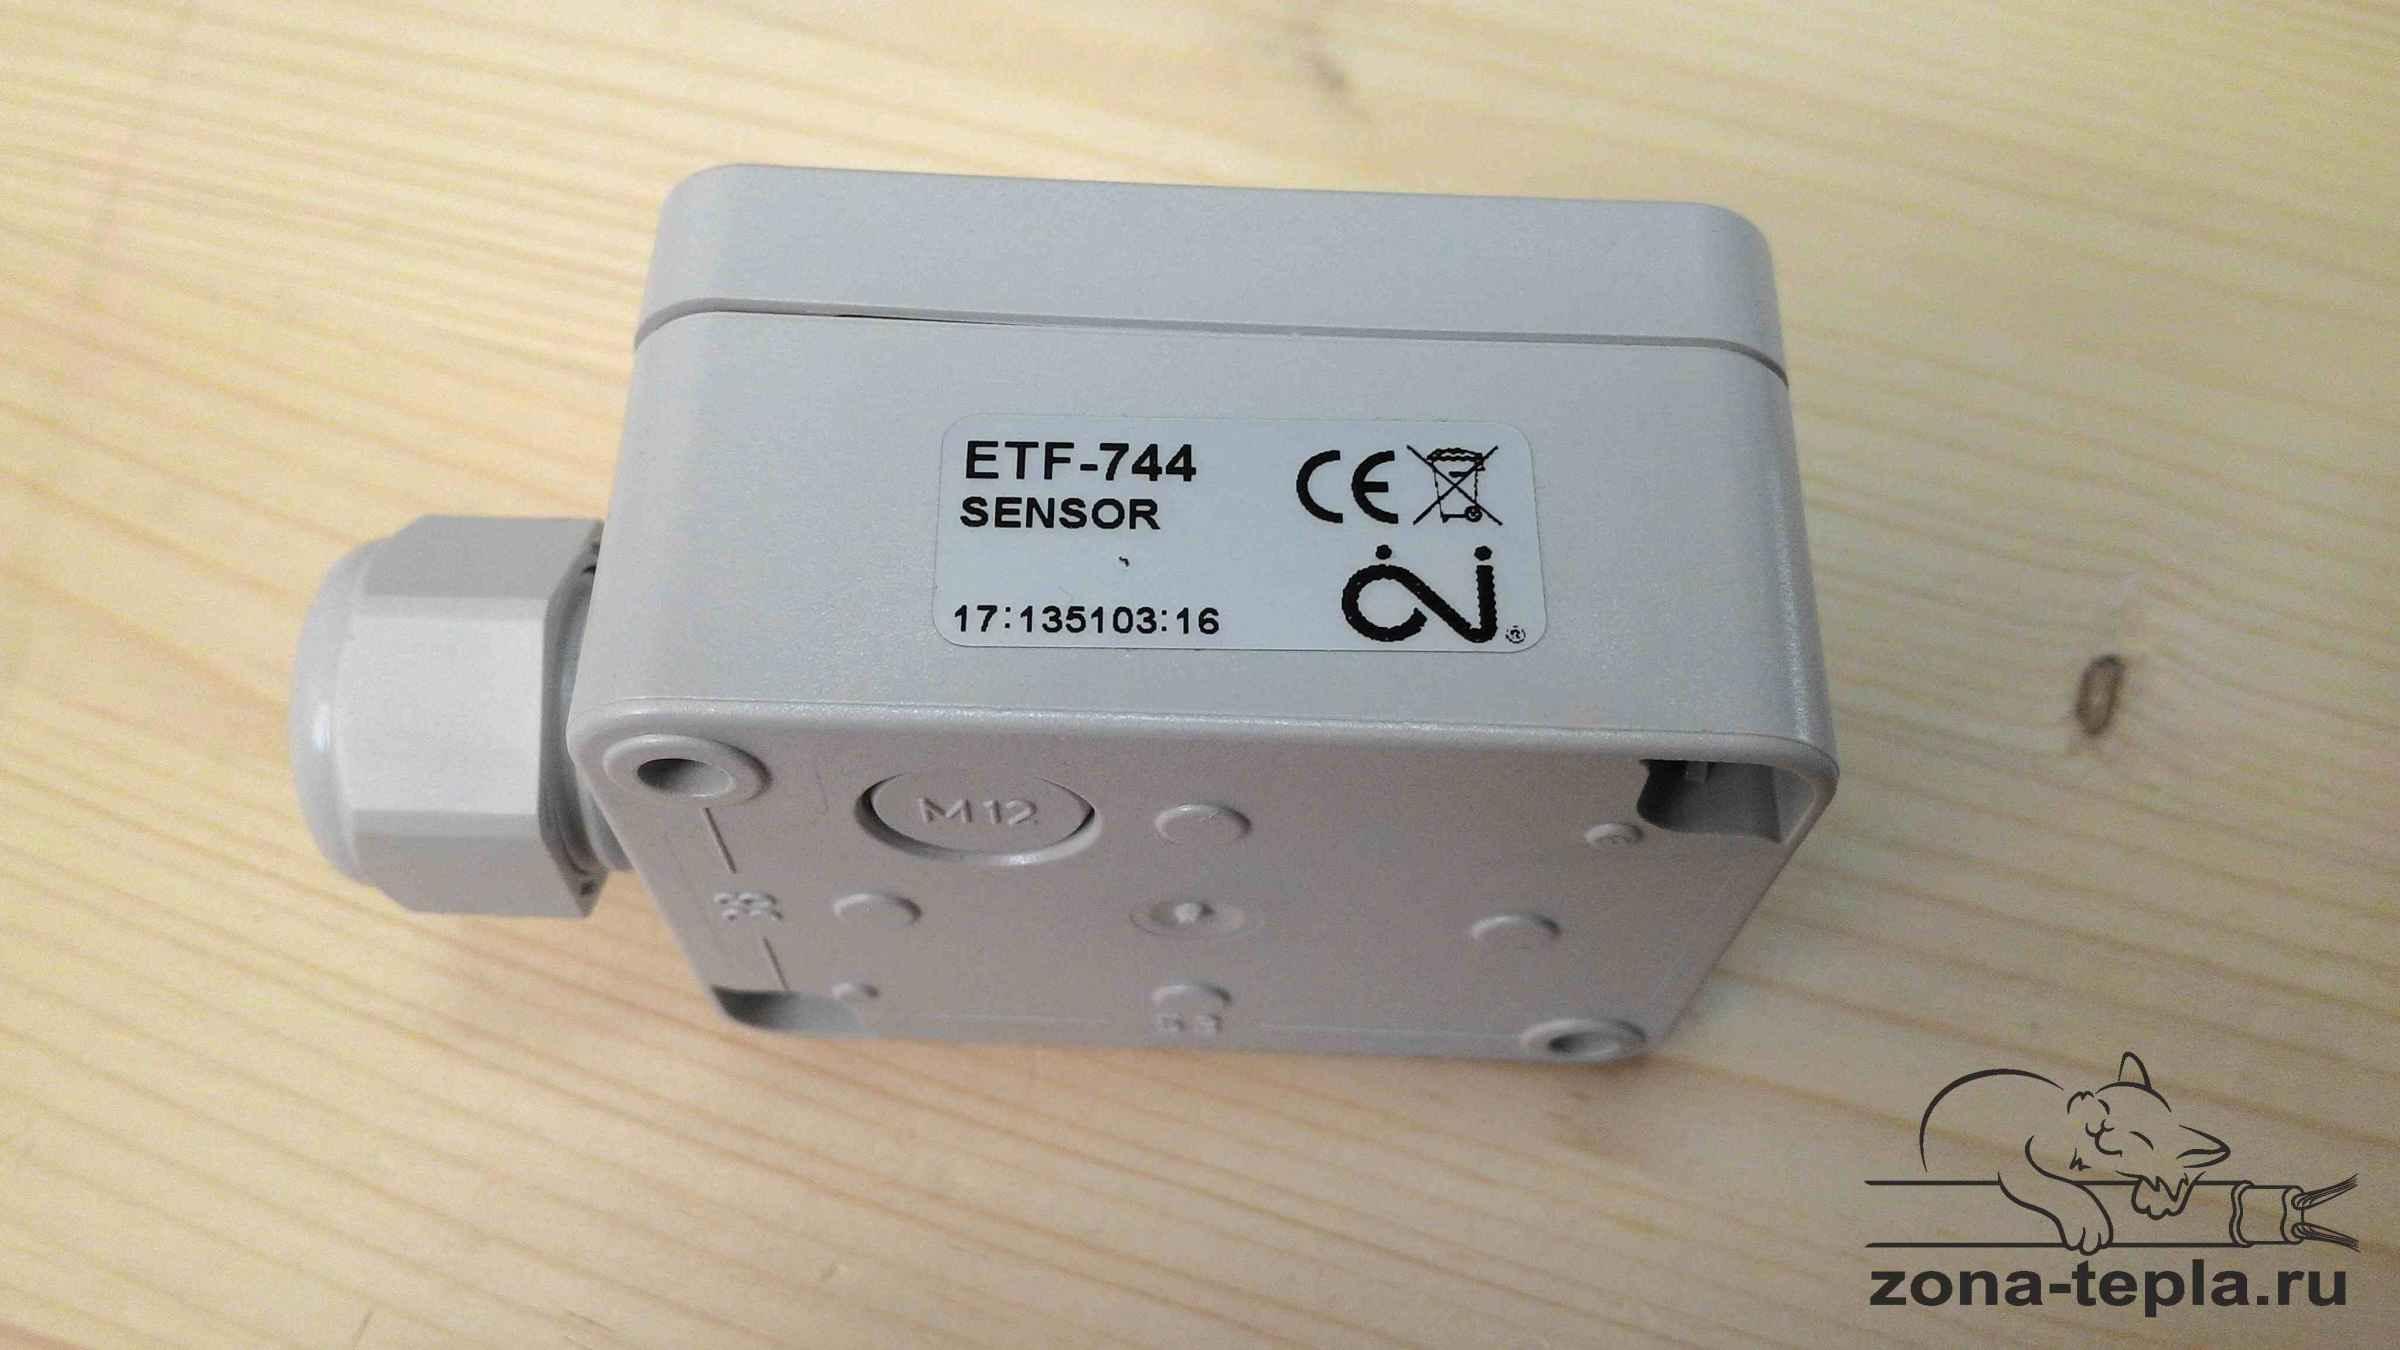 Датчик температуры для ETR-F 1447A